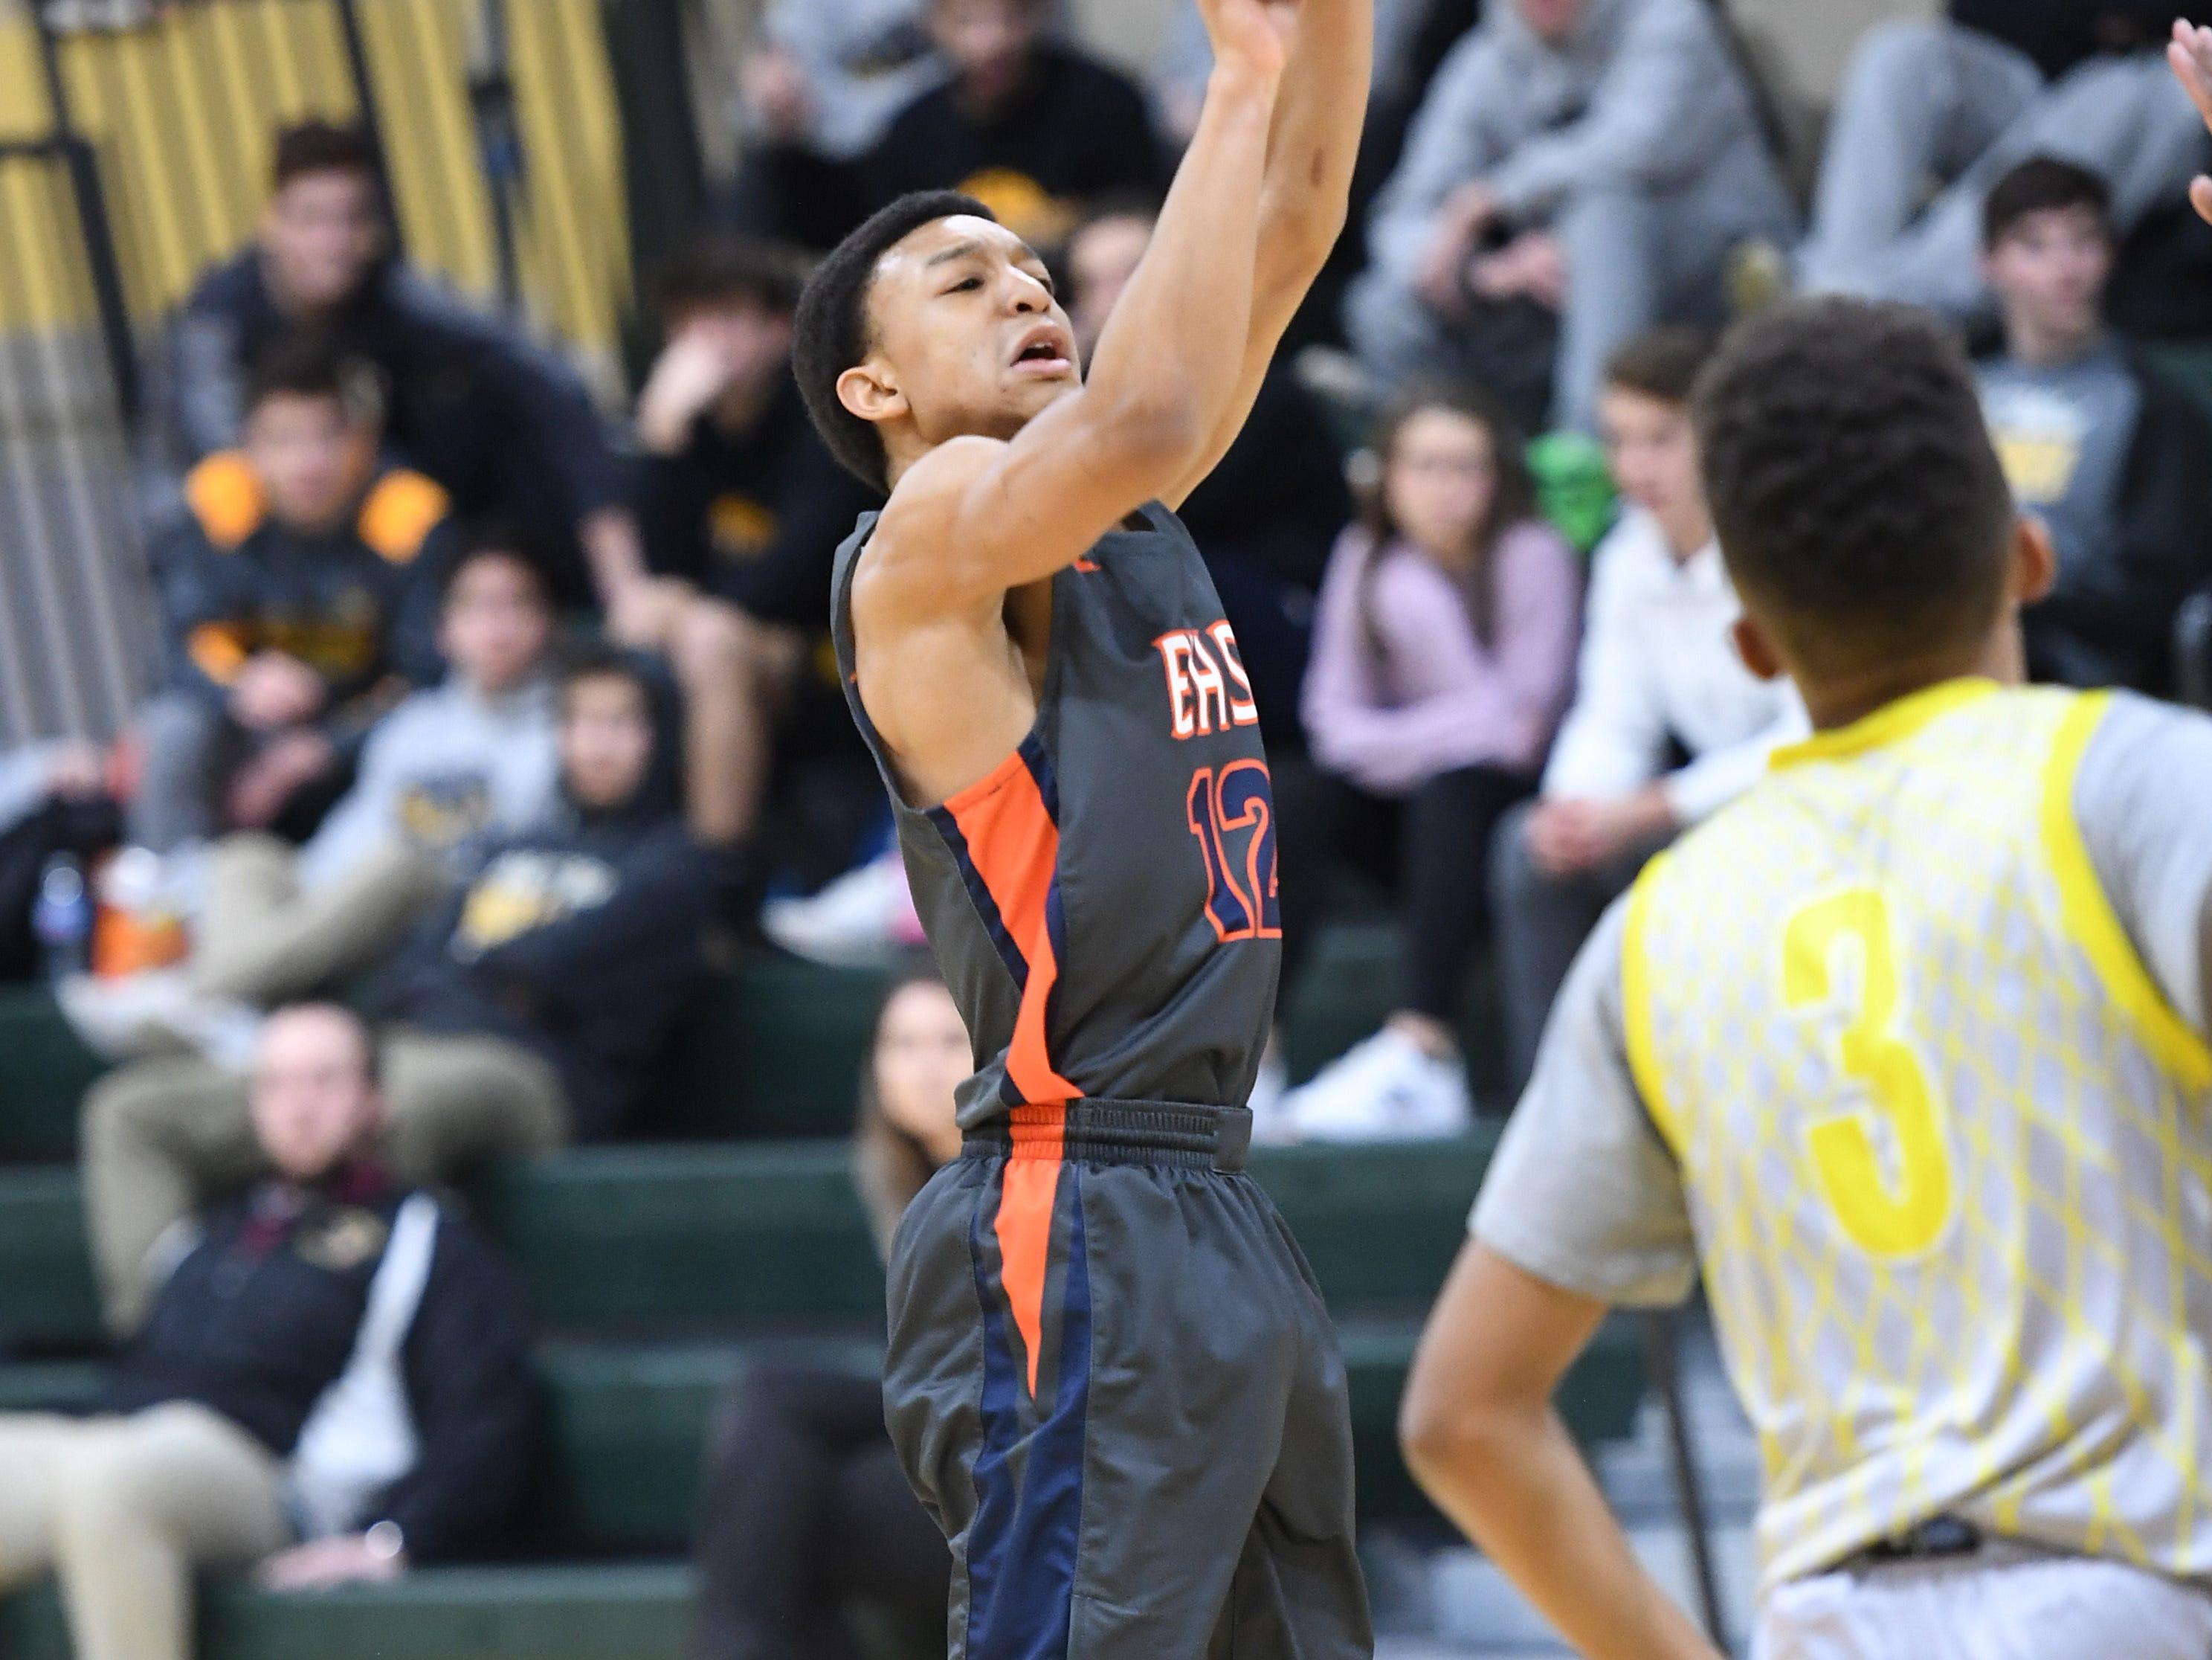 Public vs. Private Basketball Showcase at St. Joseph High School in Montvale on Saturday, January 12, 2019. E #12 Daizon Pauldo takes a shot.